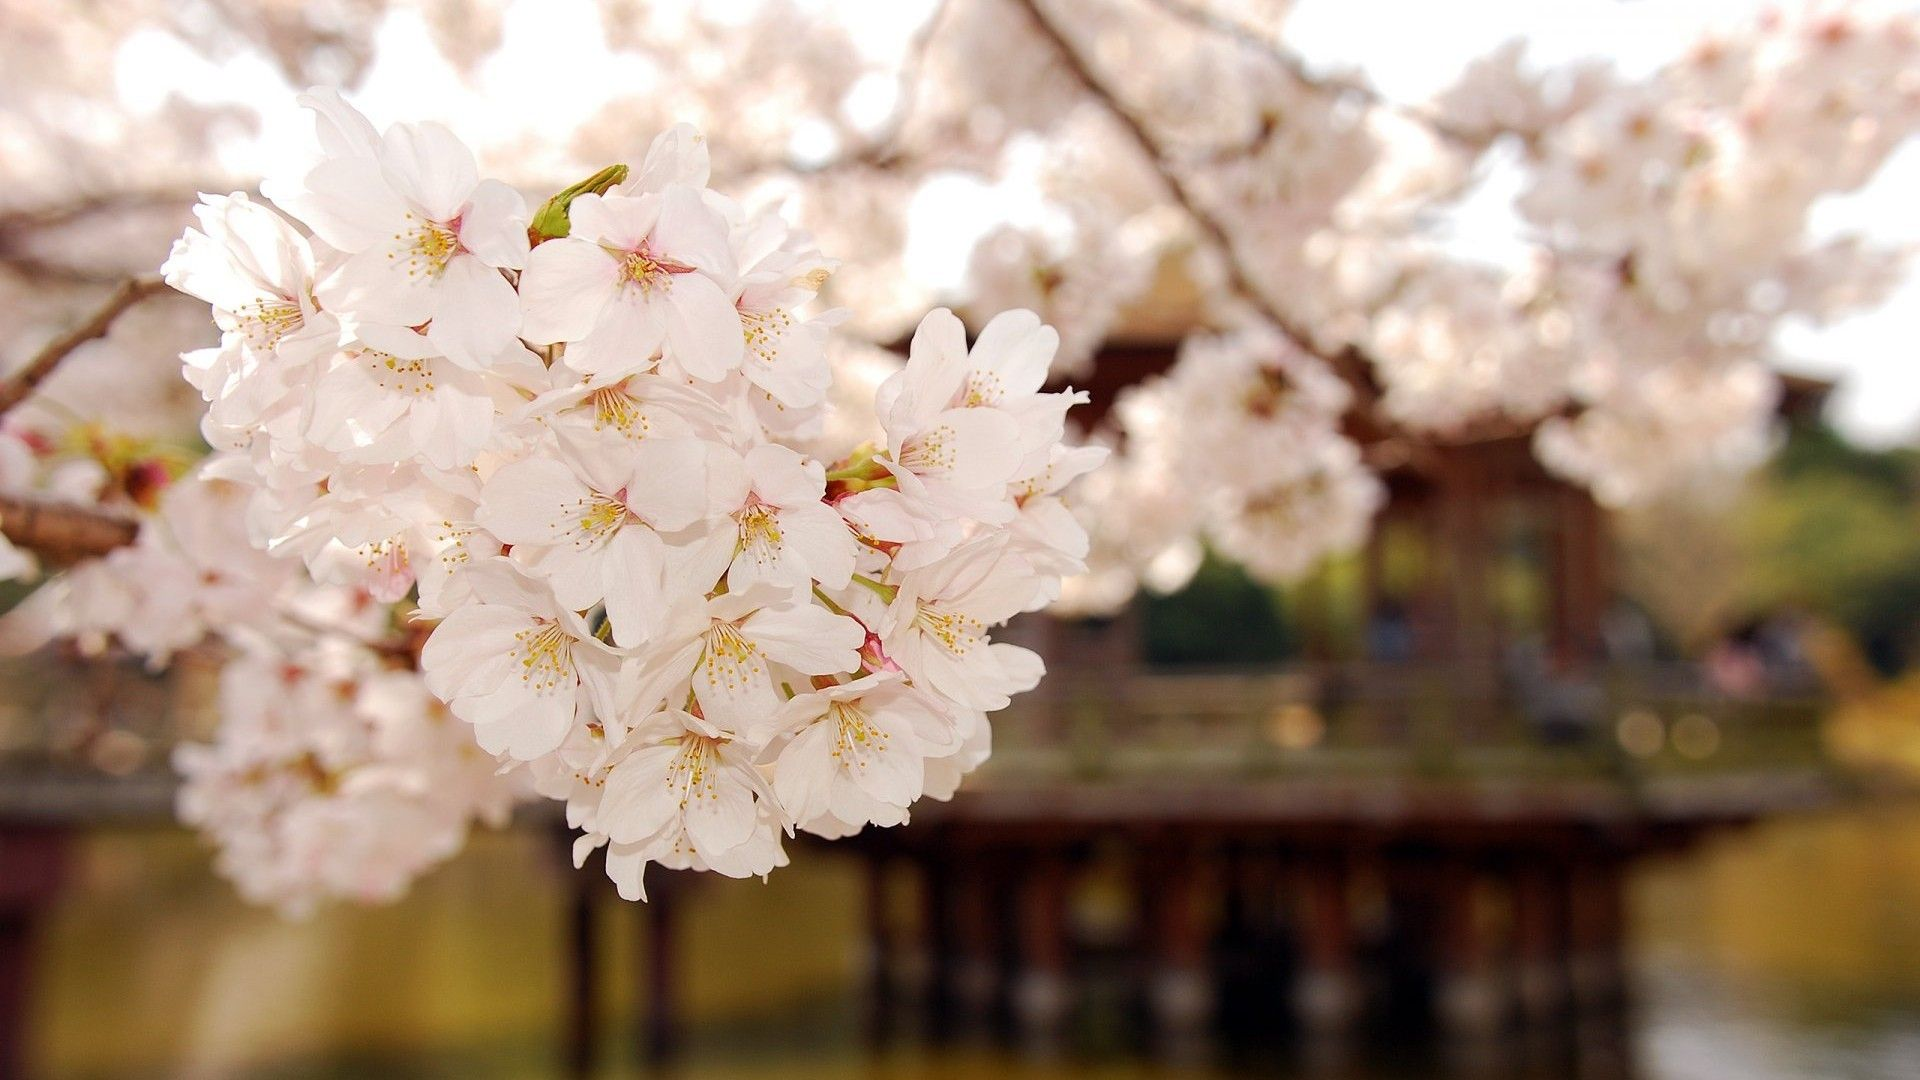 Flowers Cherry Blossom Wallpapers Images Desktop